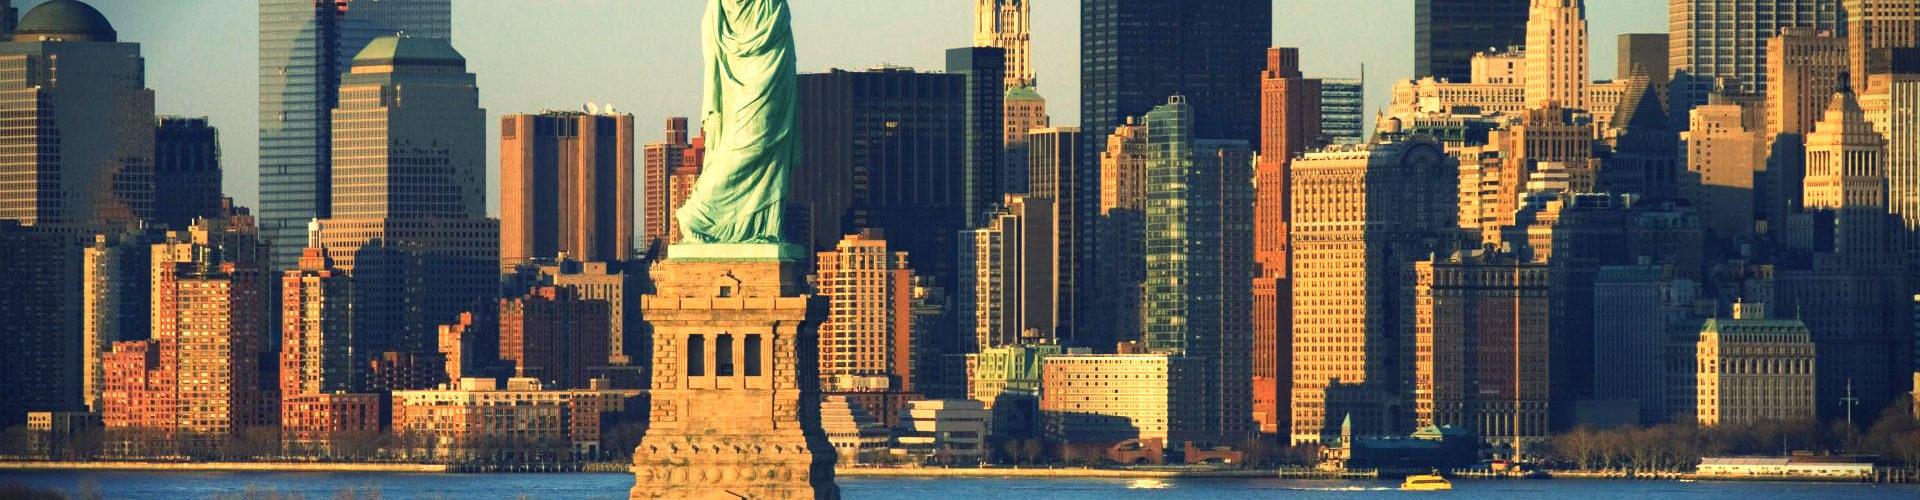 statue-liberte-liberty-island-monument-visite-featured